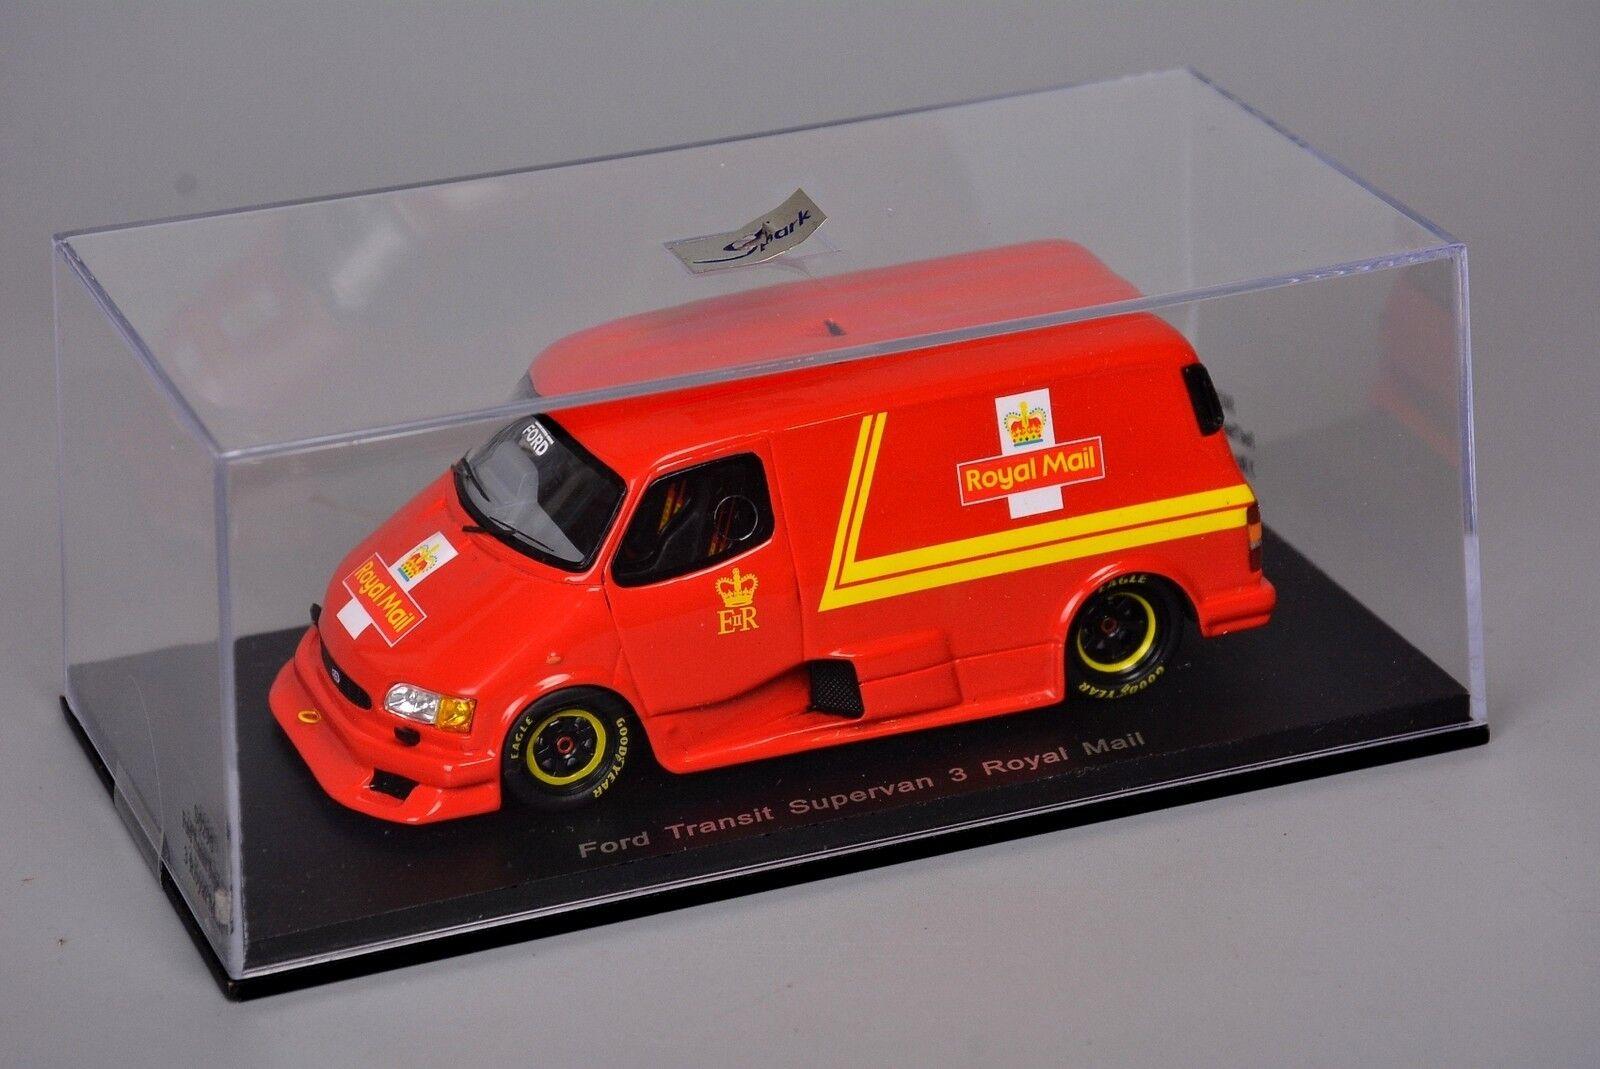 R&L Diecast  Ford Transit Supervan 3 in Royal Mail Livery, Spark, (Mk4 Mk5)